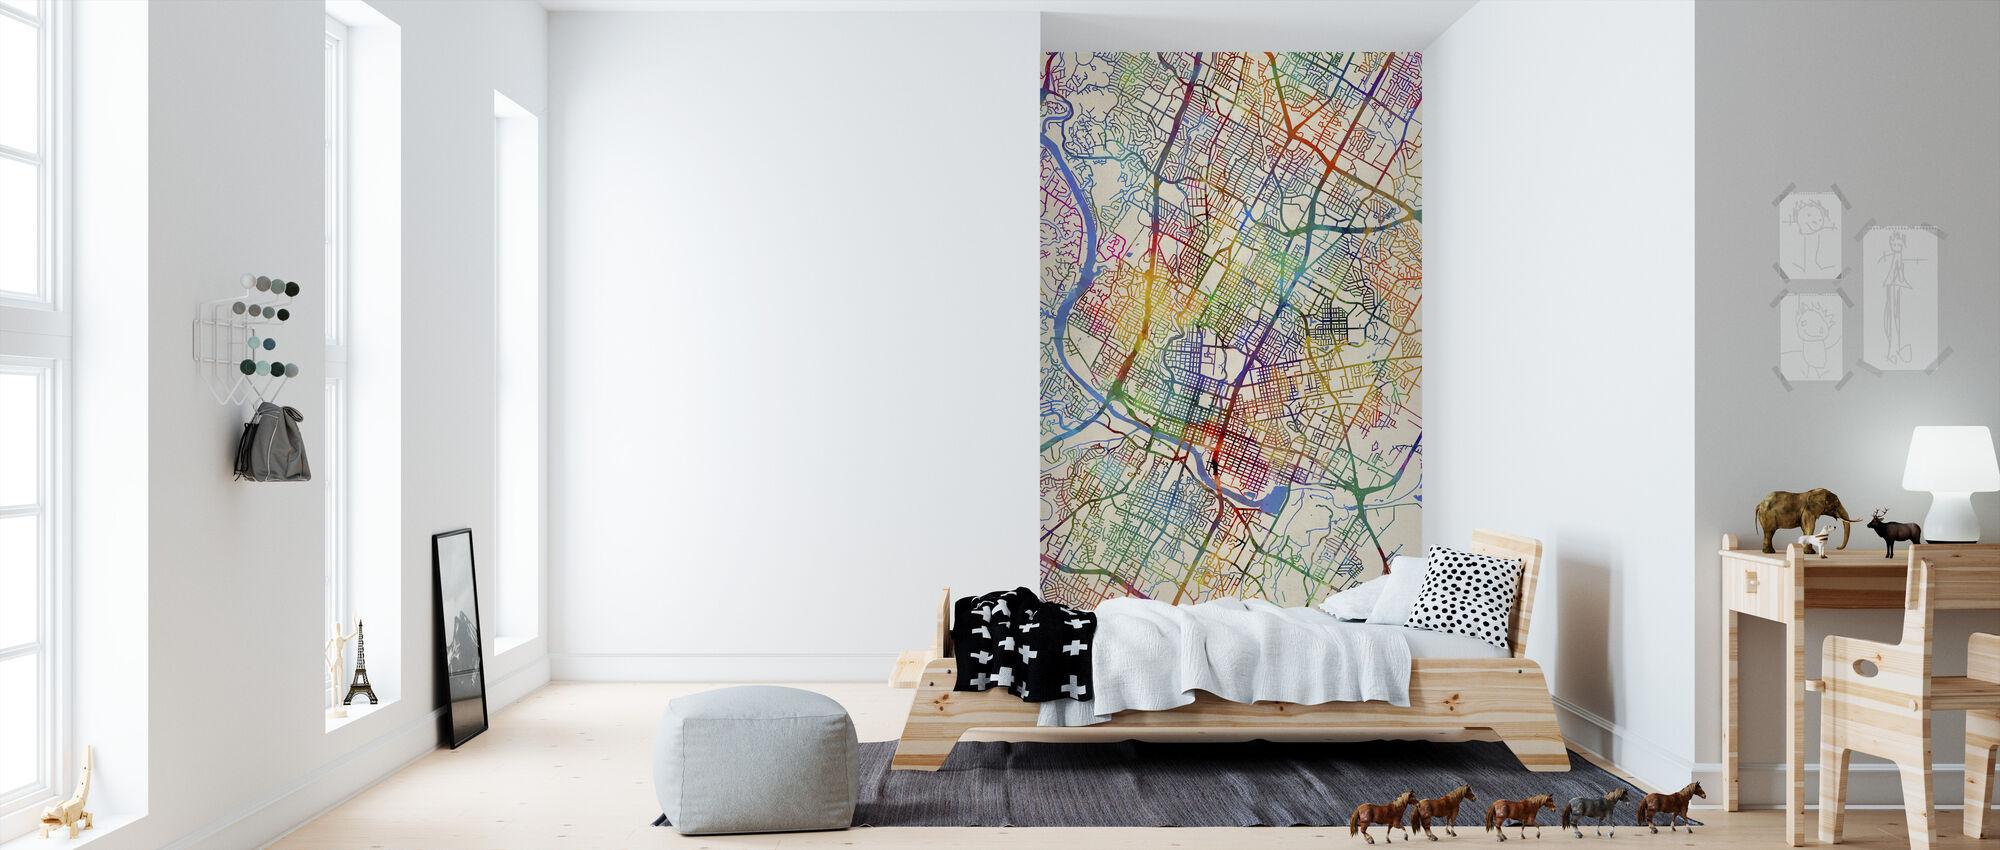 Austin Texas City Map - Wallpaper - Kids Room